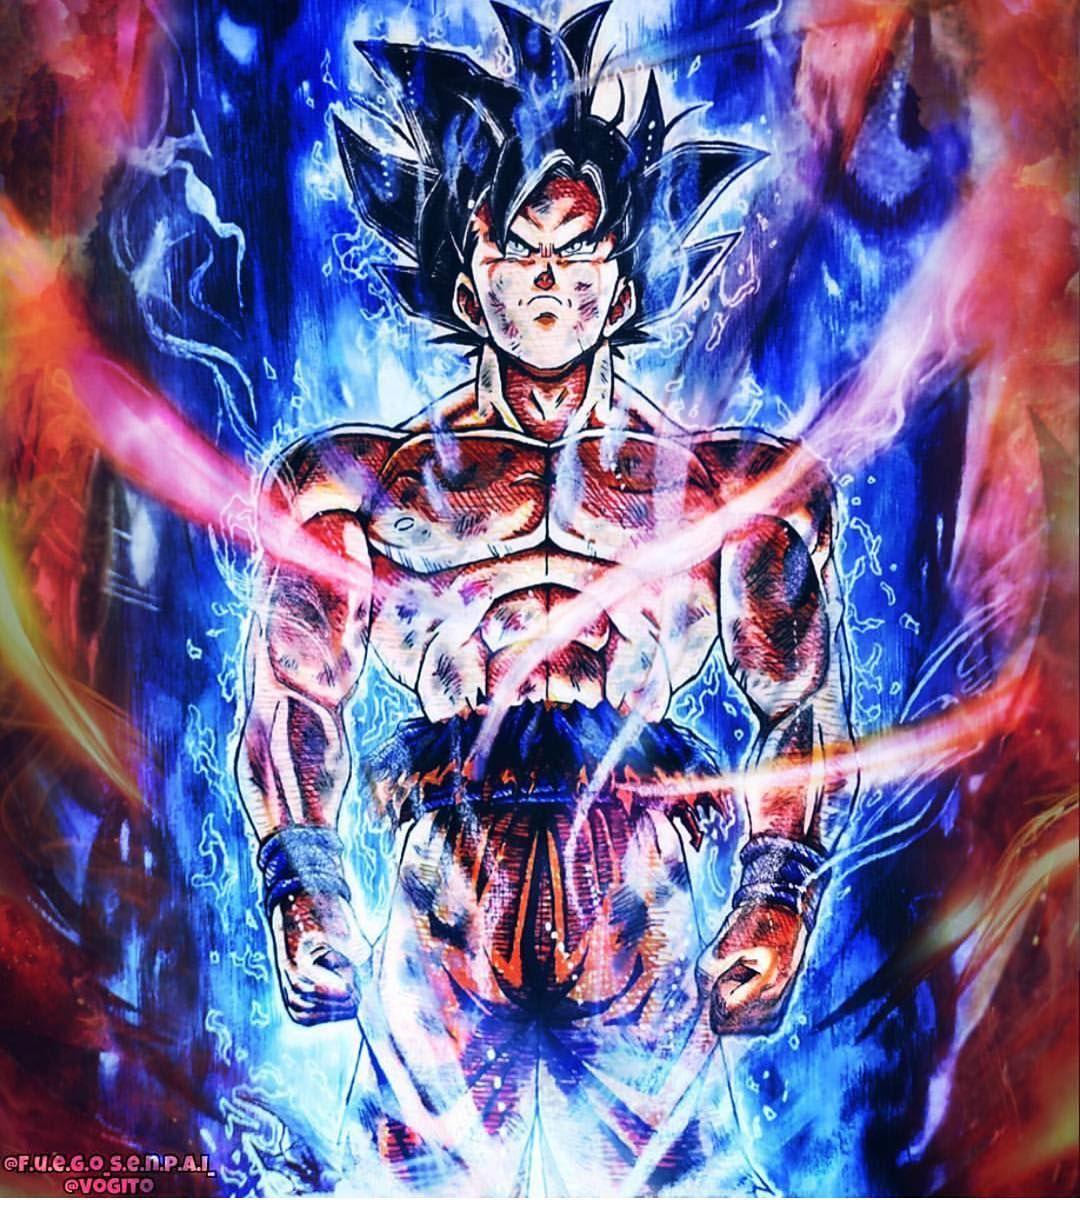 Poster 42x24 cm Dragon Ball Super Vegeta Goku Beerus Super Saiyan God Blue 01